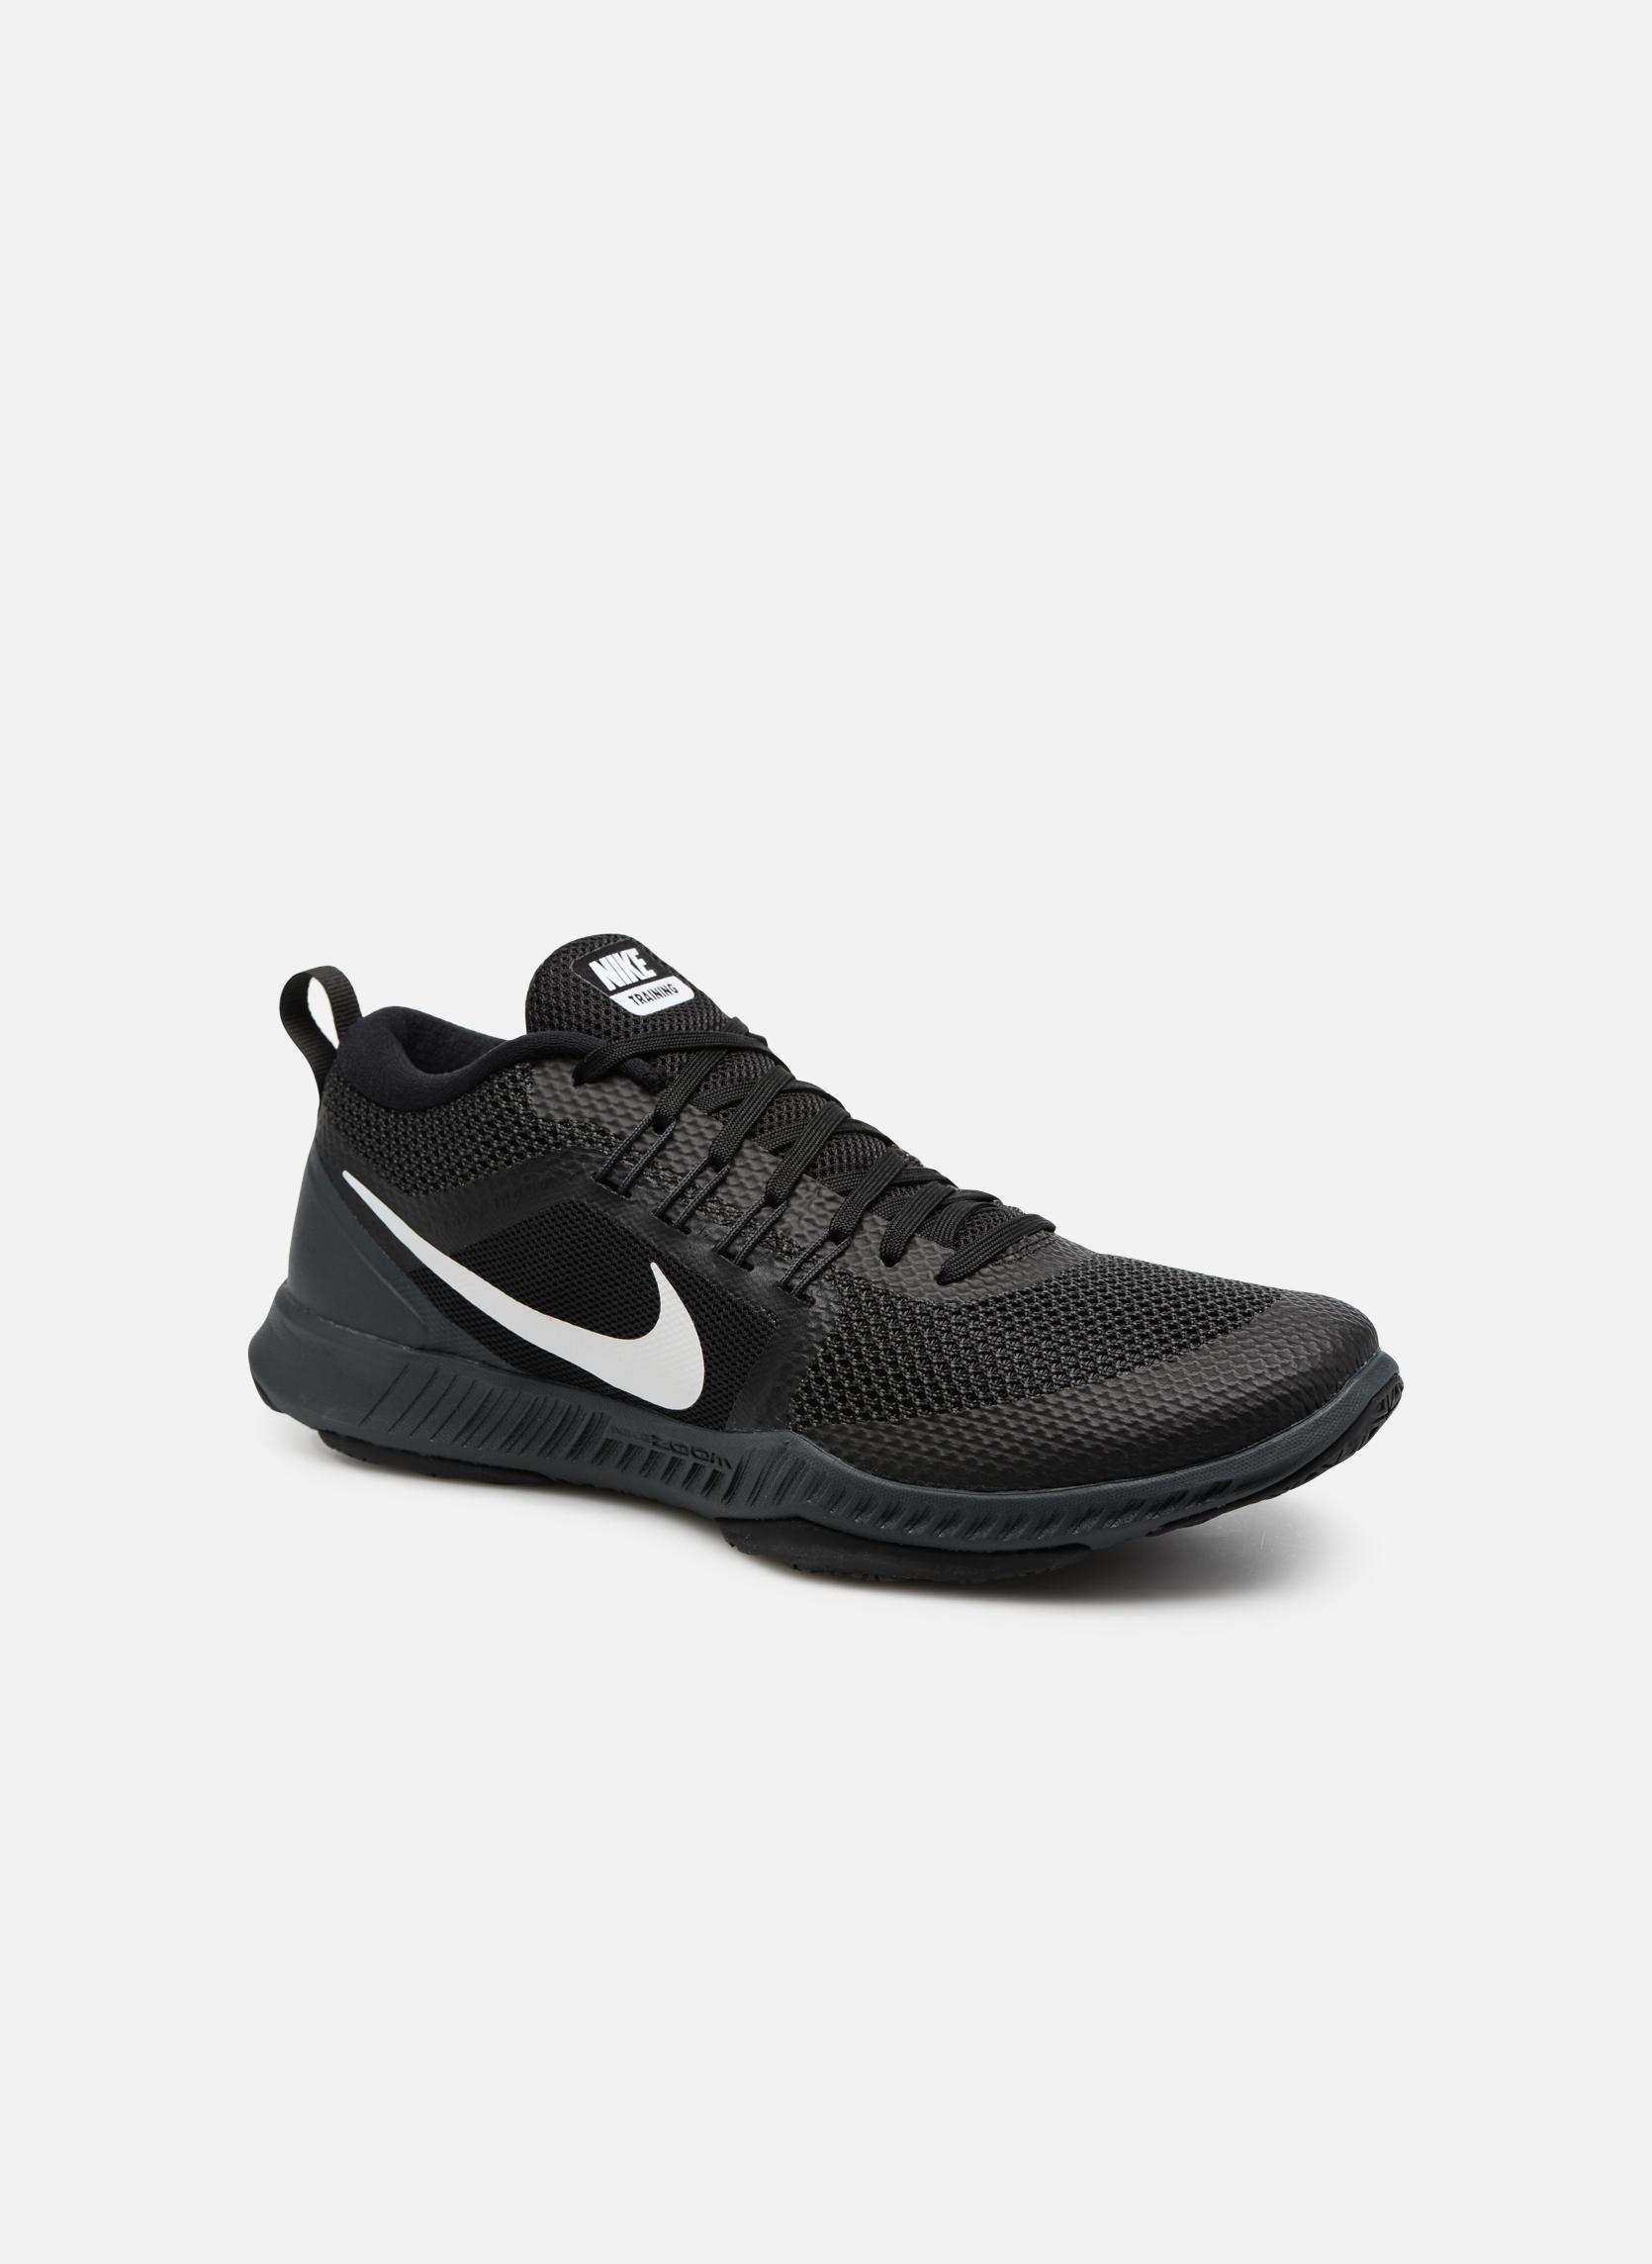 Nike Zoom Domination Tr Black/white-anthracite